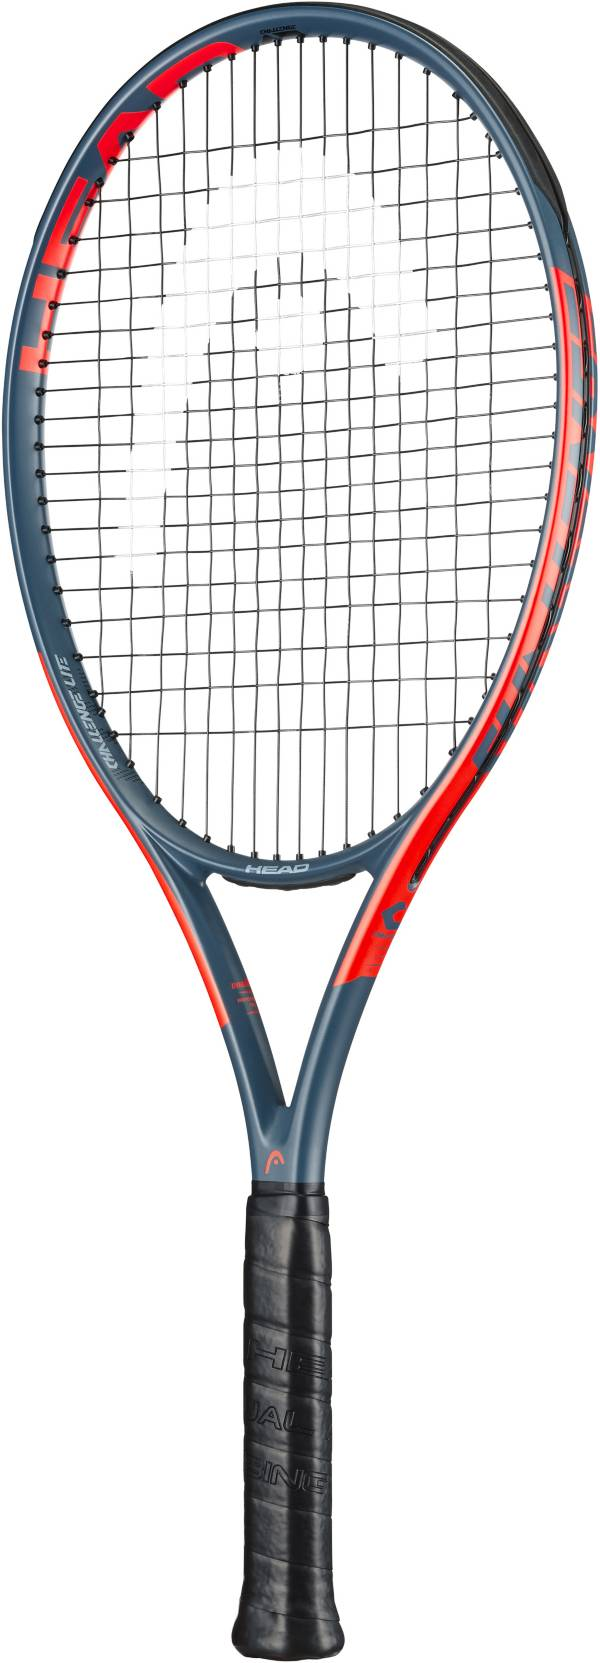 HEAD IG Challenge Radical Tennis Racquet product image